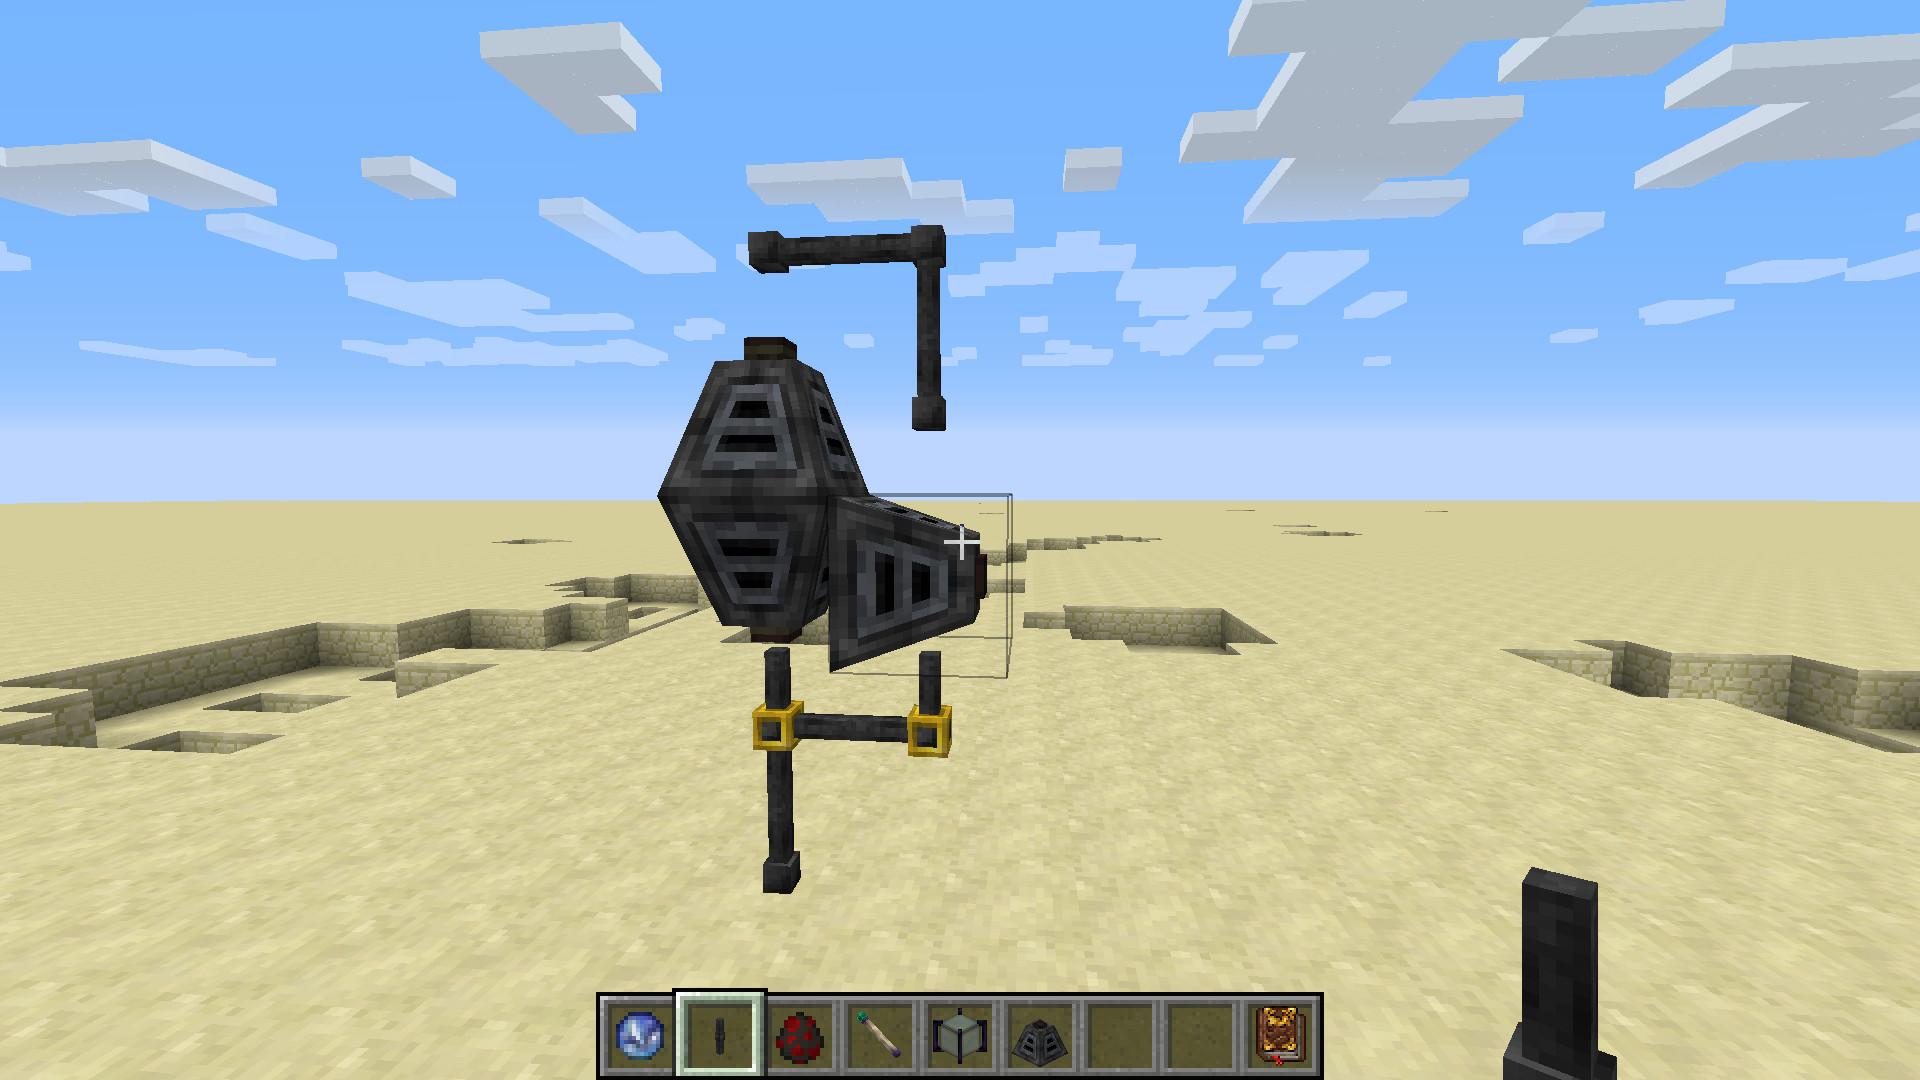 minecraft mod pack 1.9